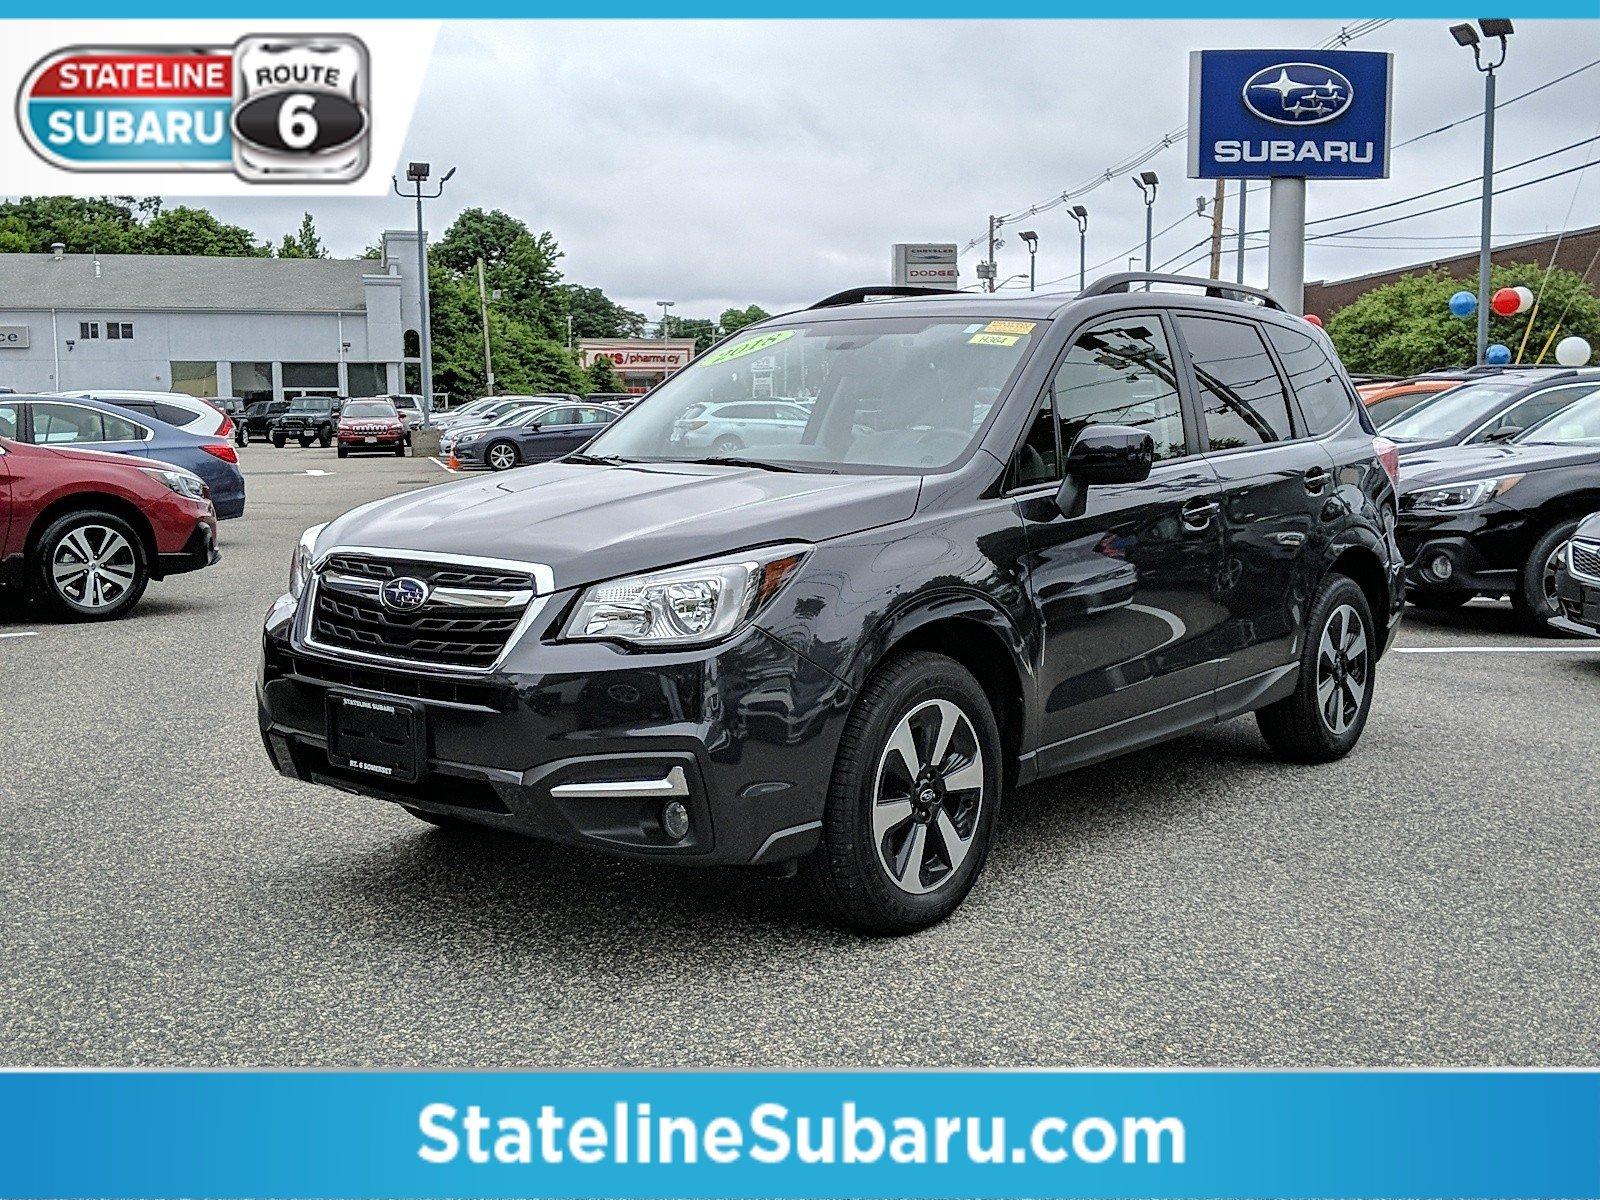 Used 2018 Subaru Forester For Sale at Stateline Subaru   VIN